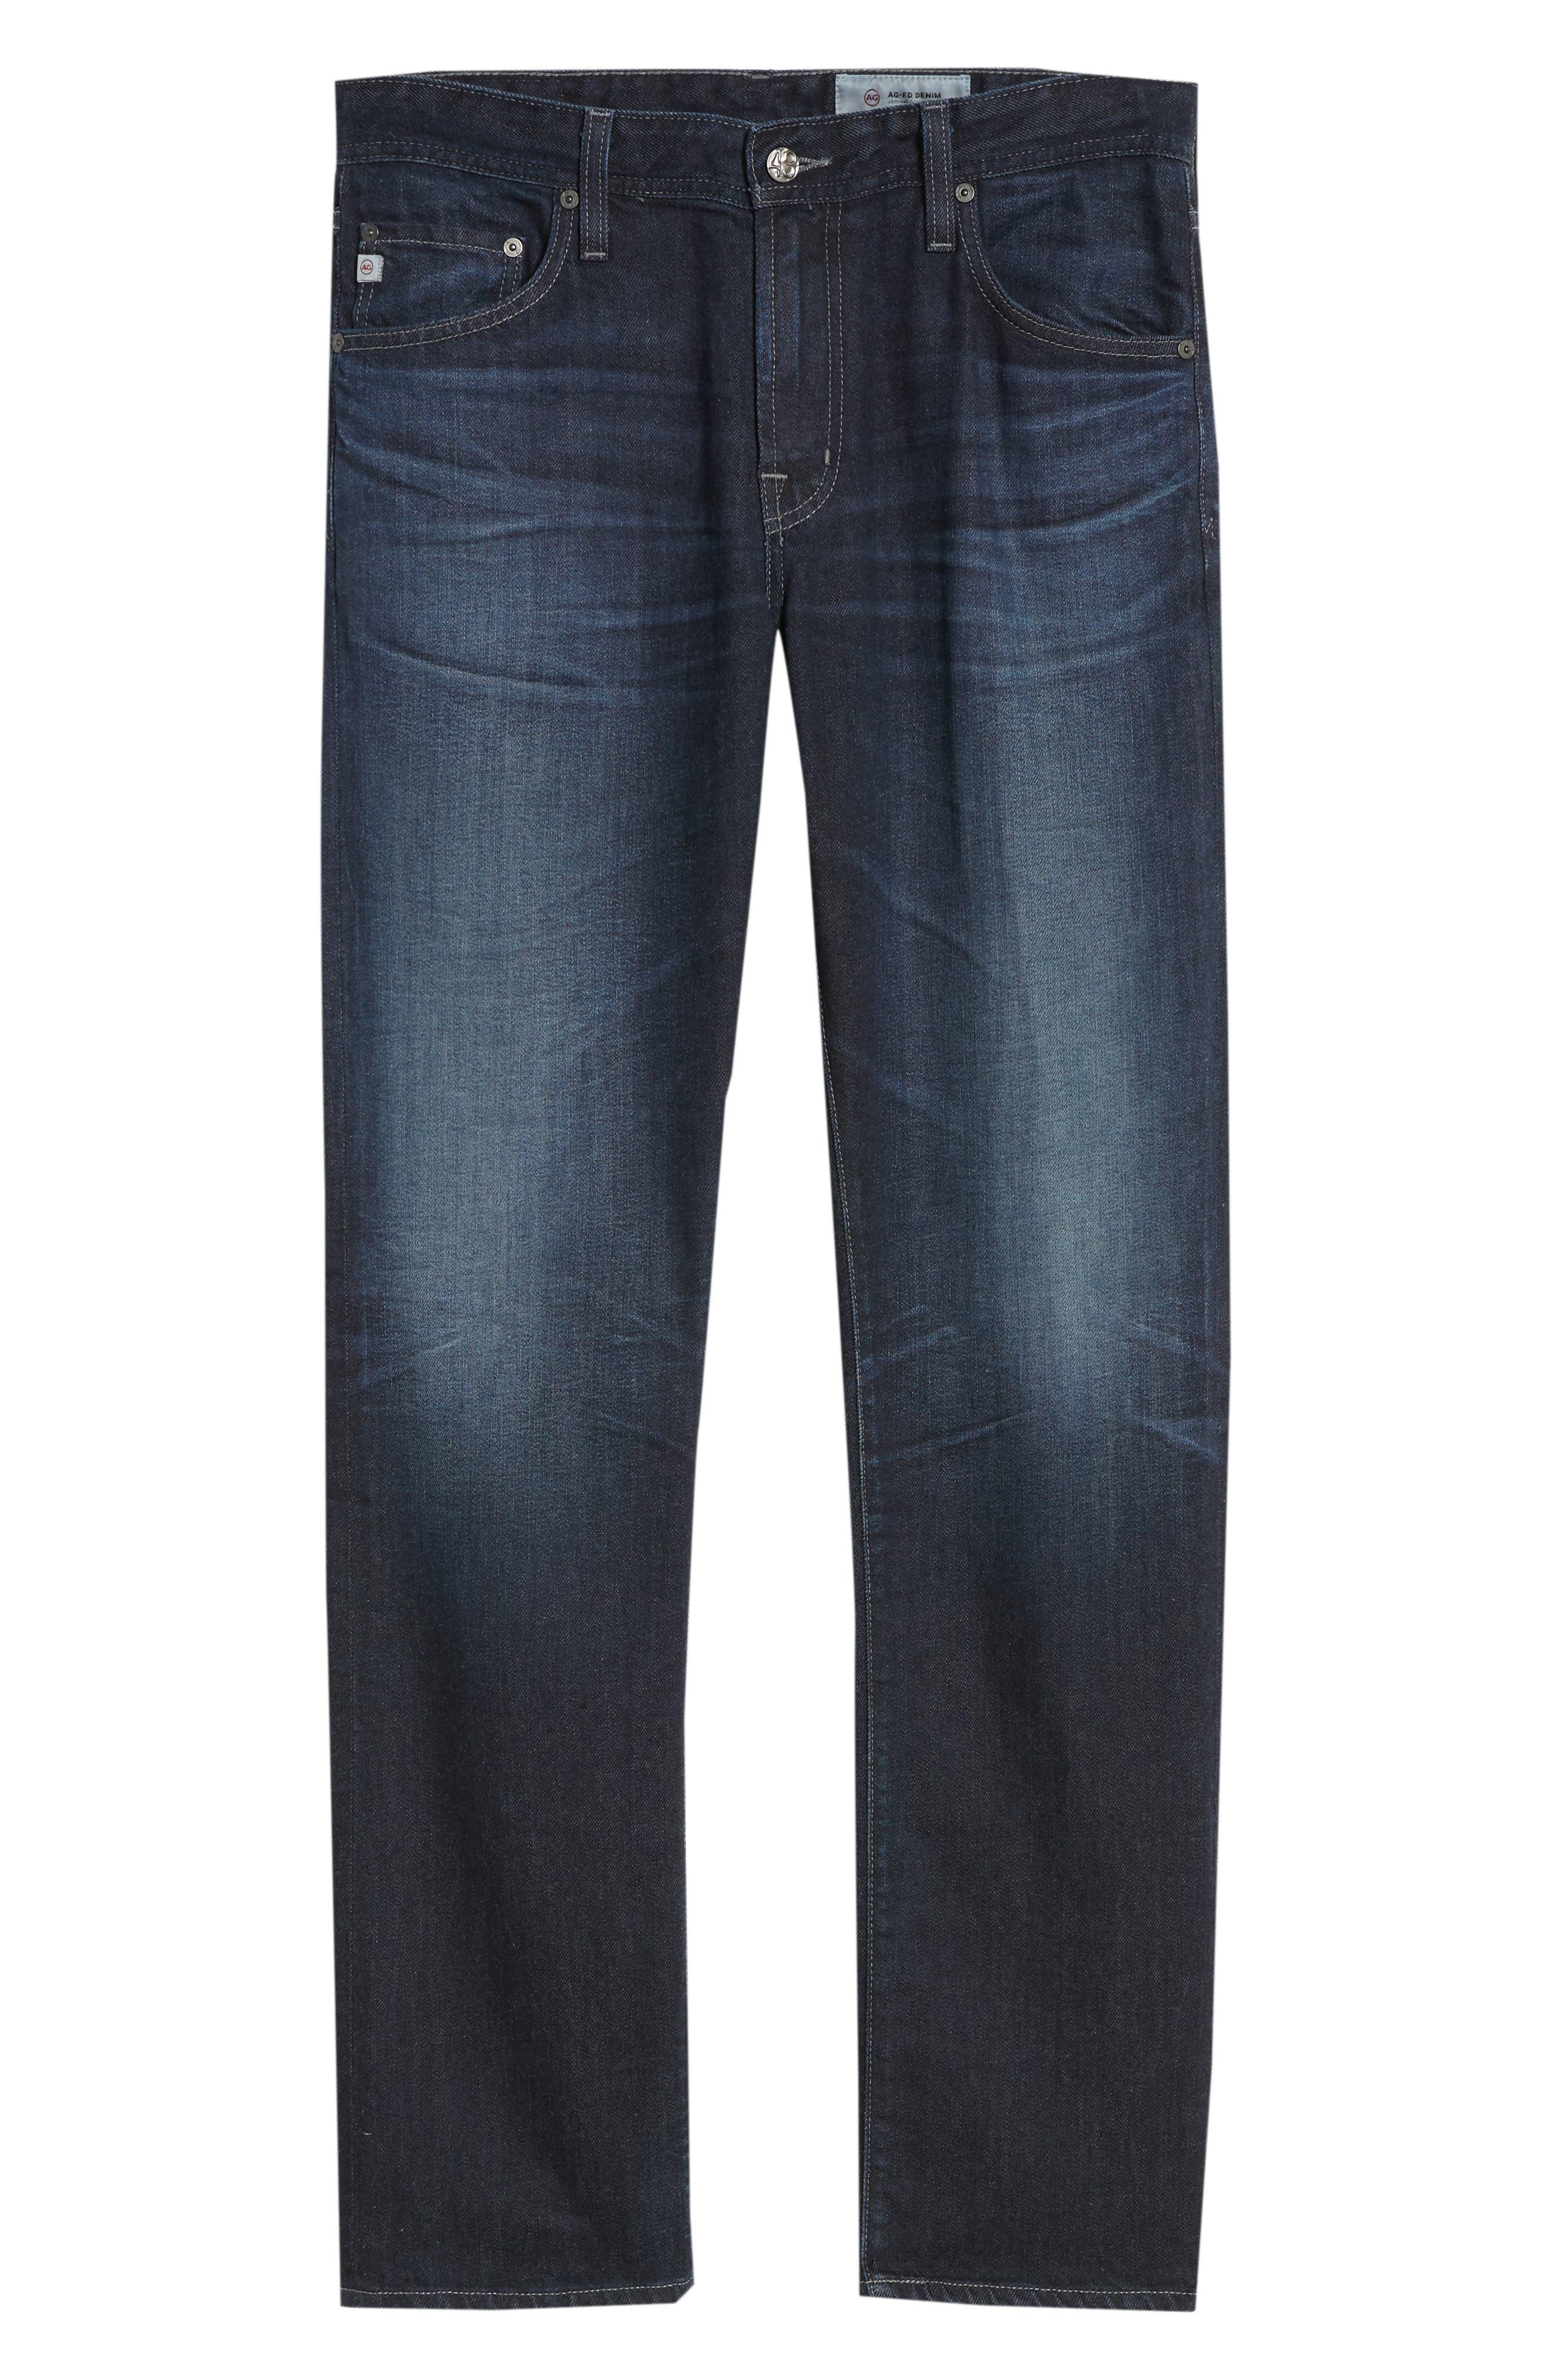 Graduate Slim Straight Leg Jeans,                             Alternate thumbnail 6, color,                             486